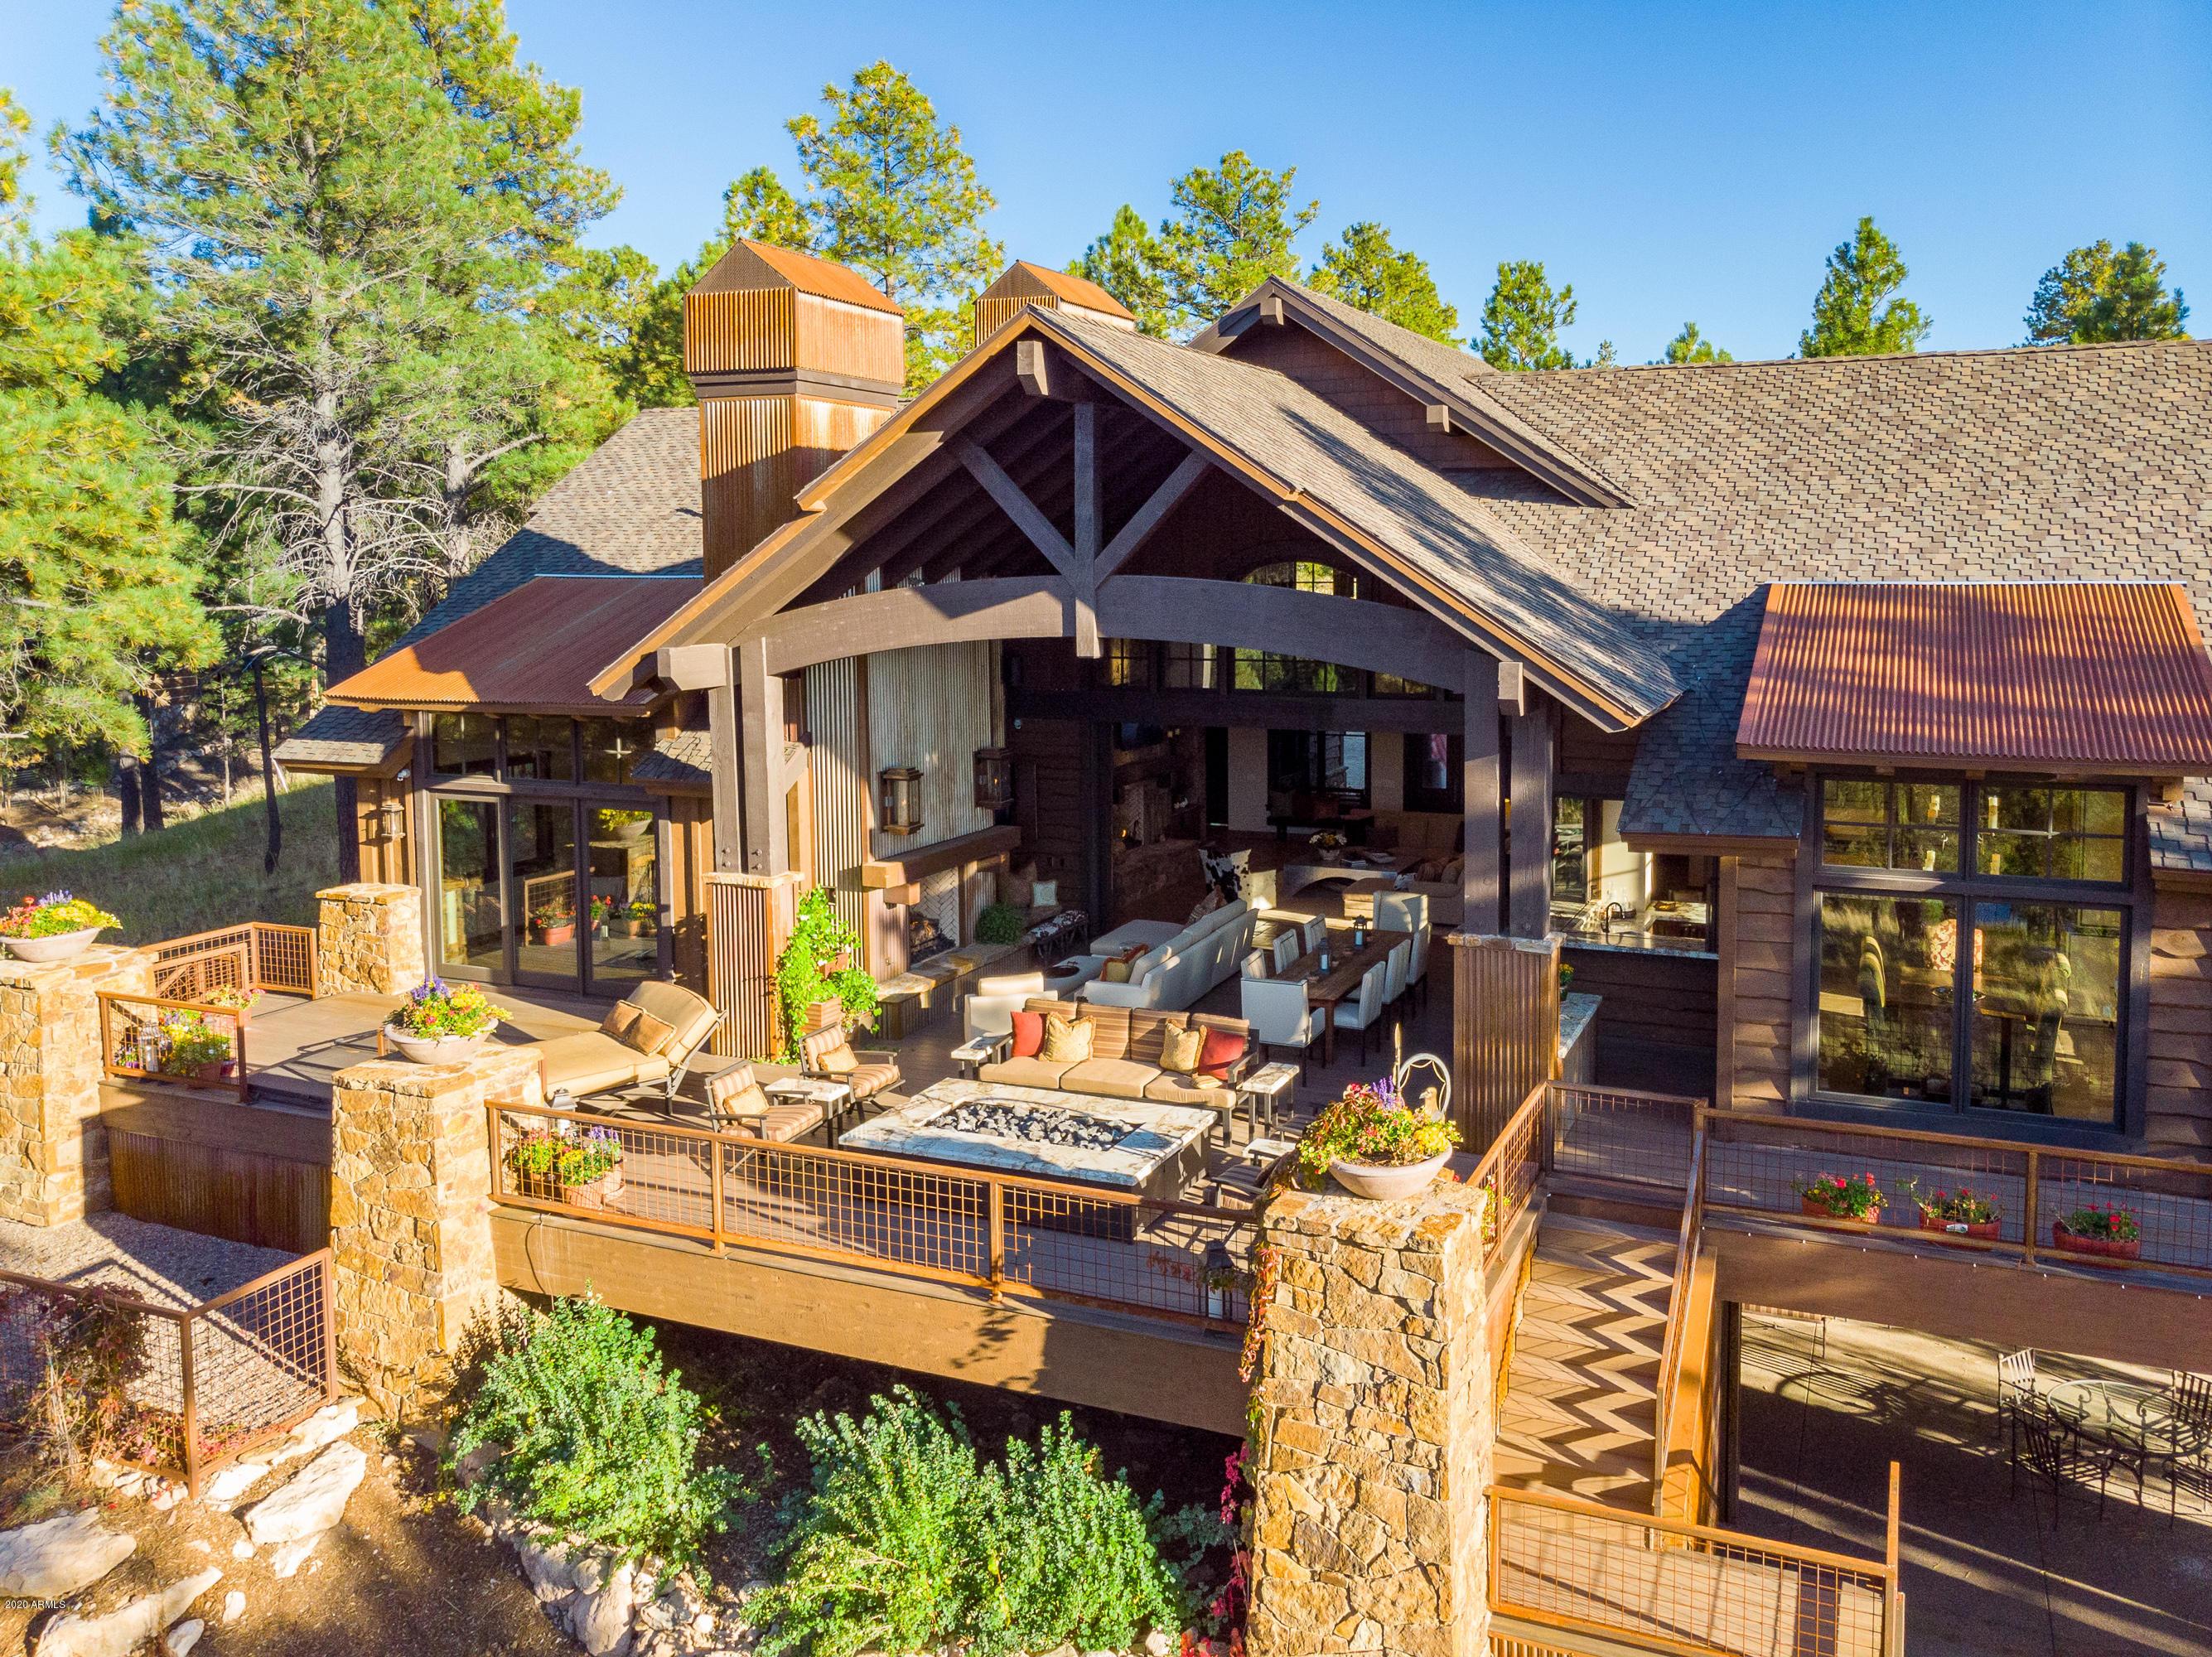 3443 Pimlico Court, Flagstaff, Arizona 86005, 4 Bedrooms Bedrooms, ,6 BathroomsBathrooms,Residential,For Sale,Pimlico,6036142